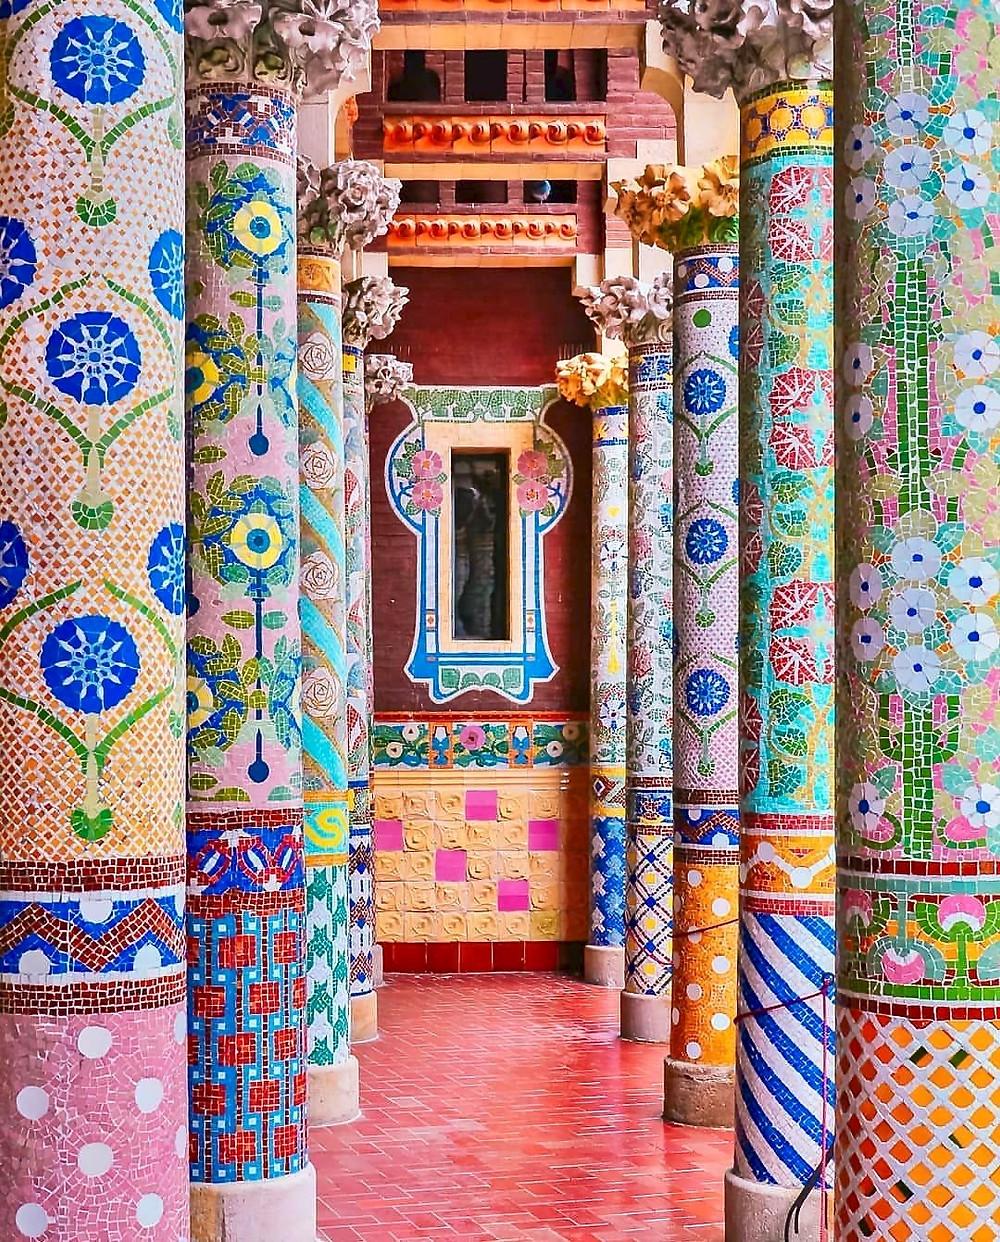 mosaic columns of Palau de la Musica